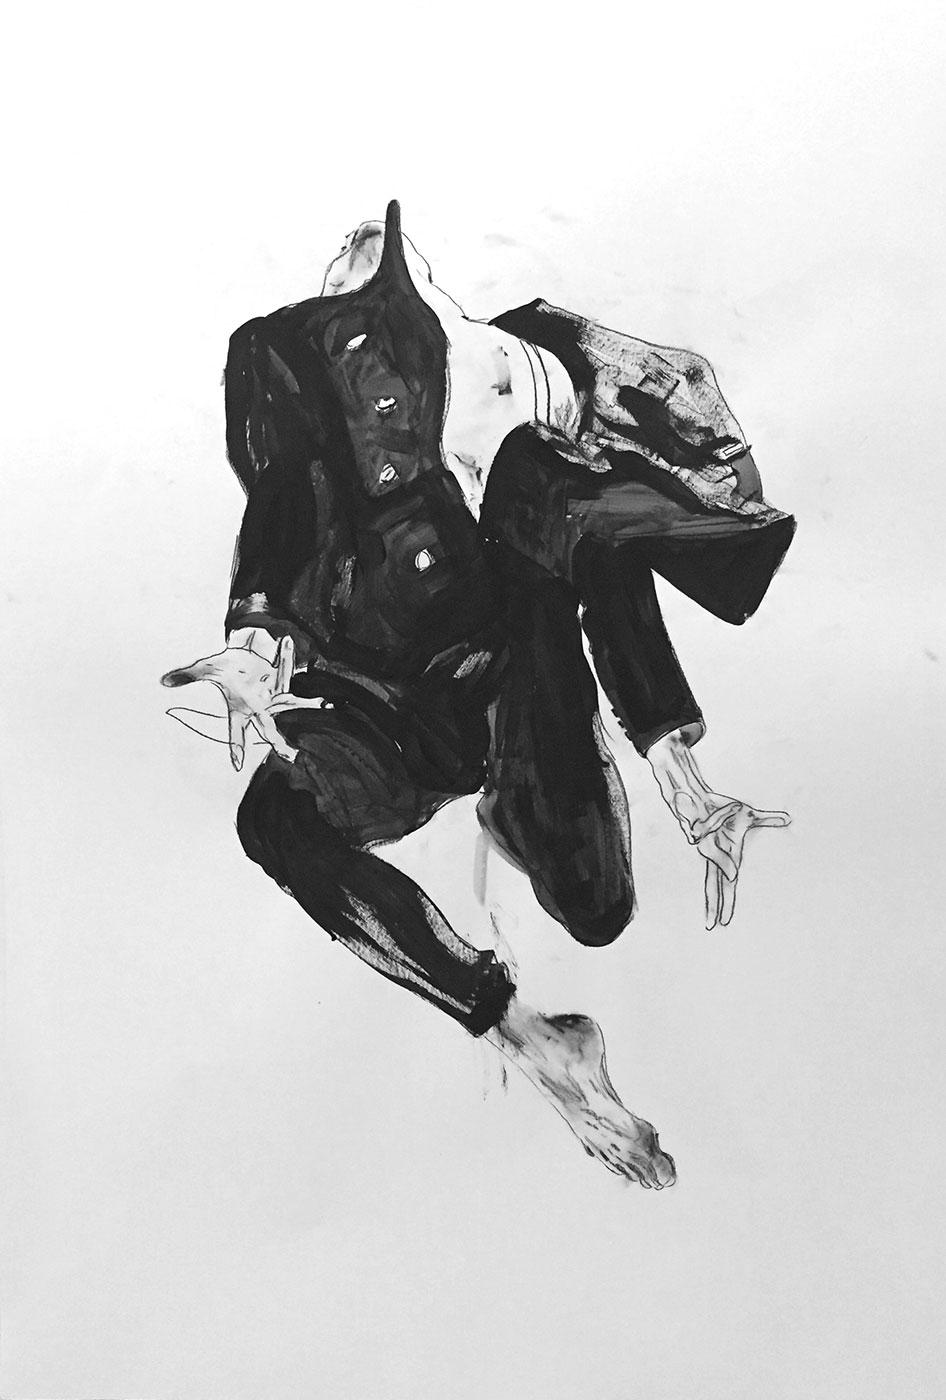 Mais-Sundermann_Tänzer#4_Kohle,-Acryl-auf-Papier_70x100cm.jpg